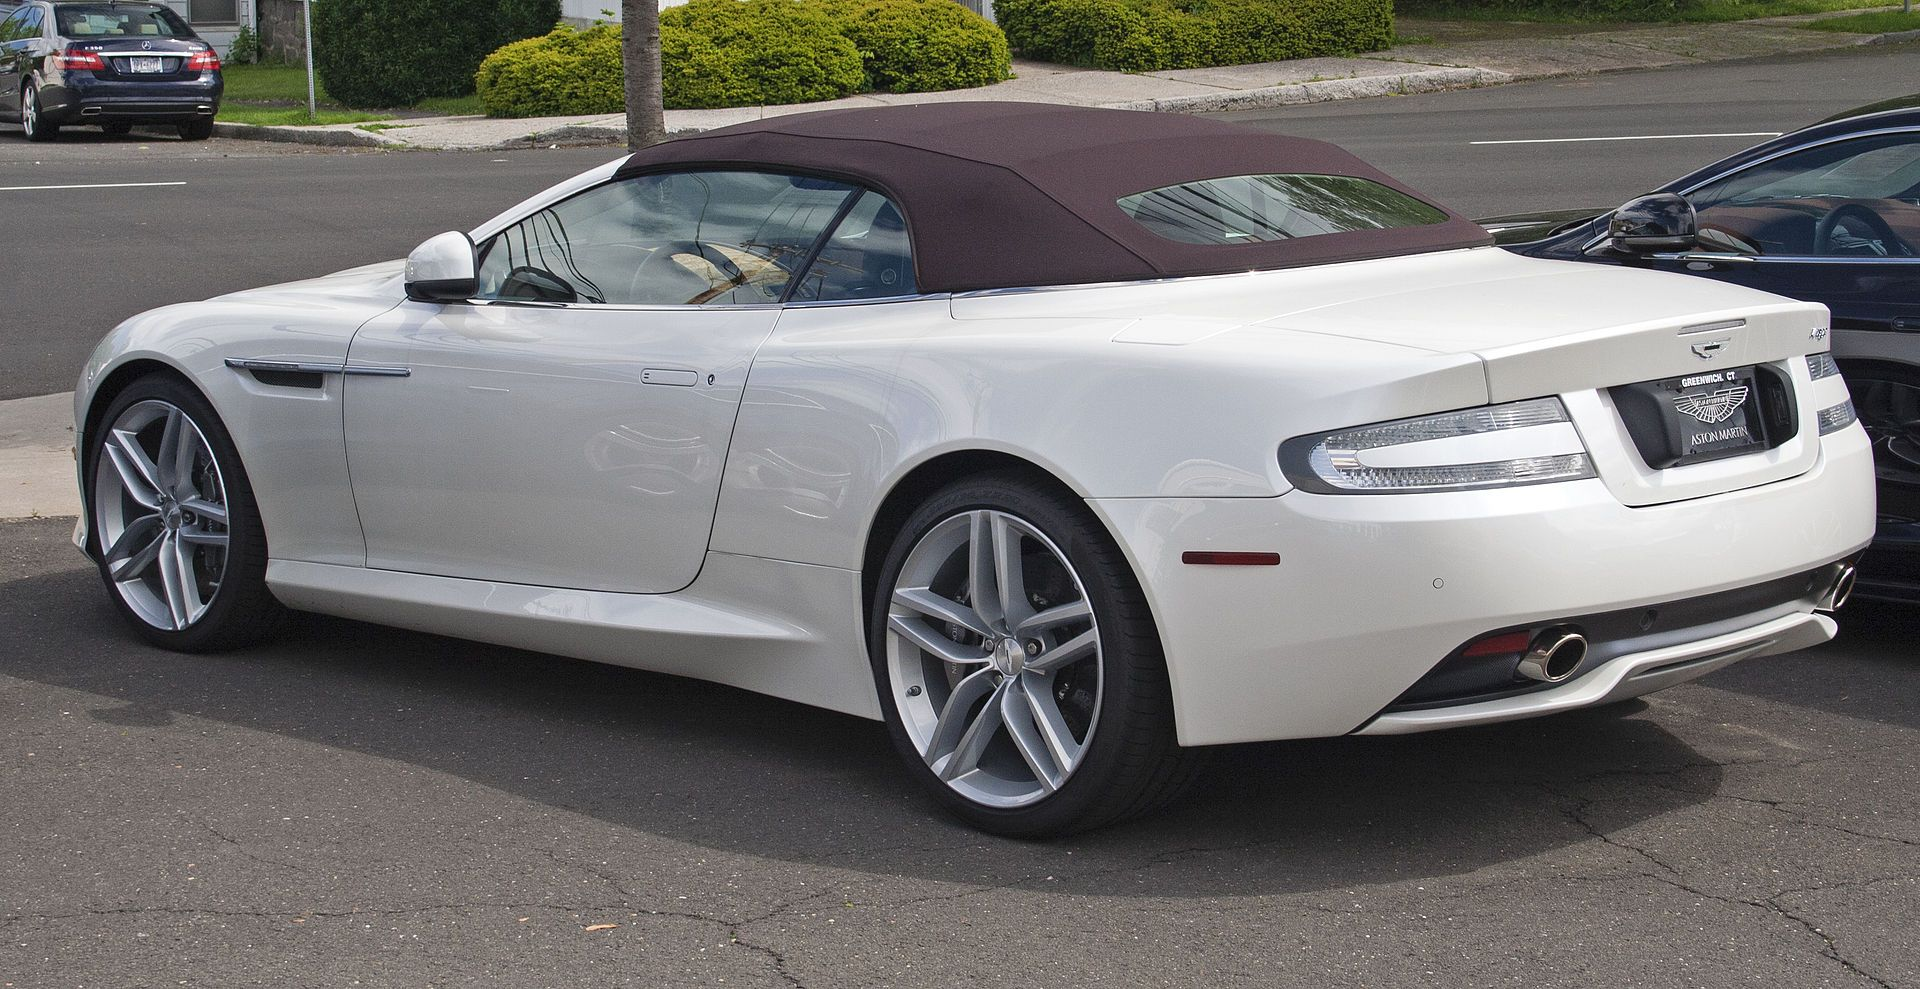 AM Virage Volante Rear Aston Martin Virage Wikipedia Boss - Aston martin virage coupe